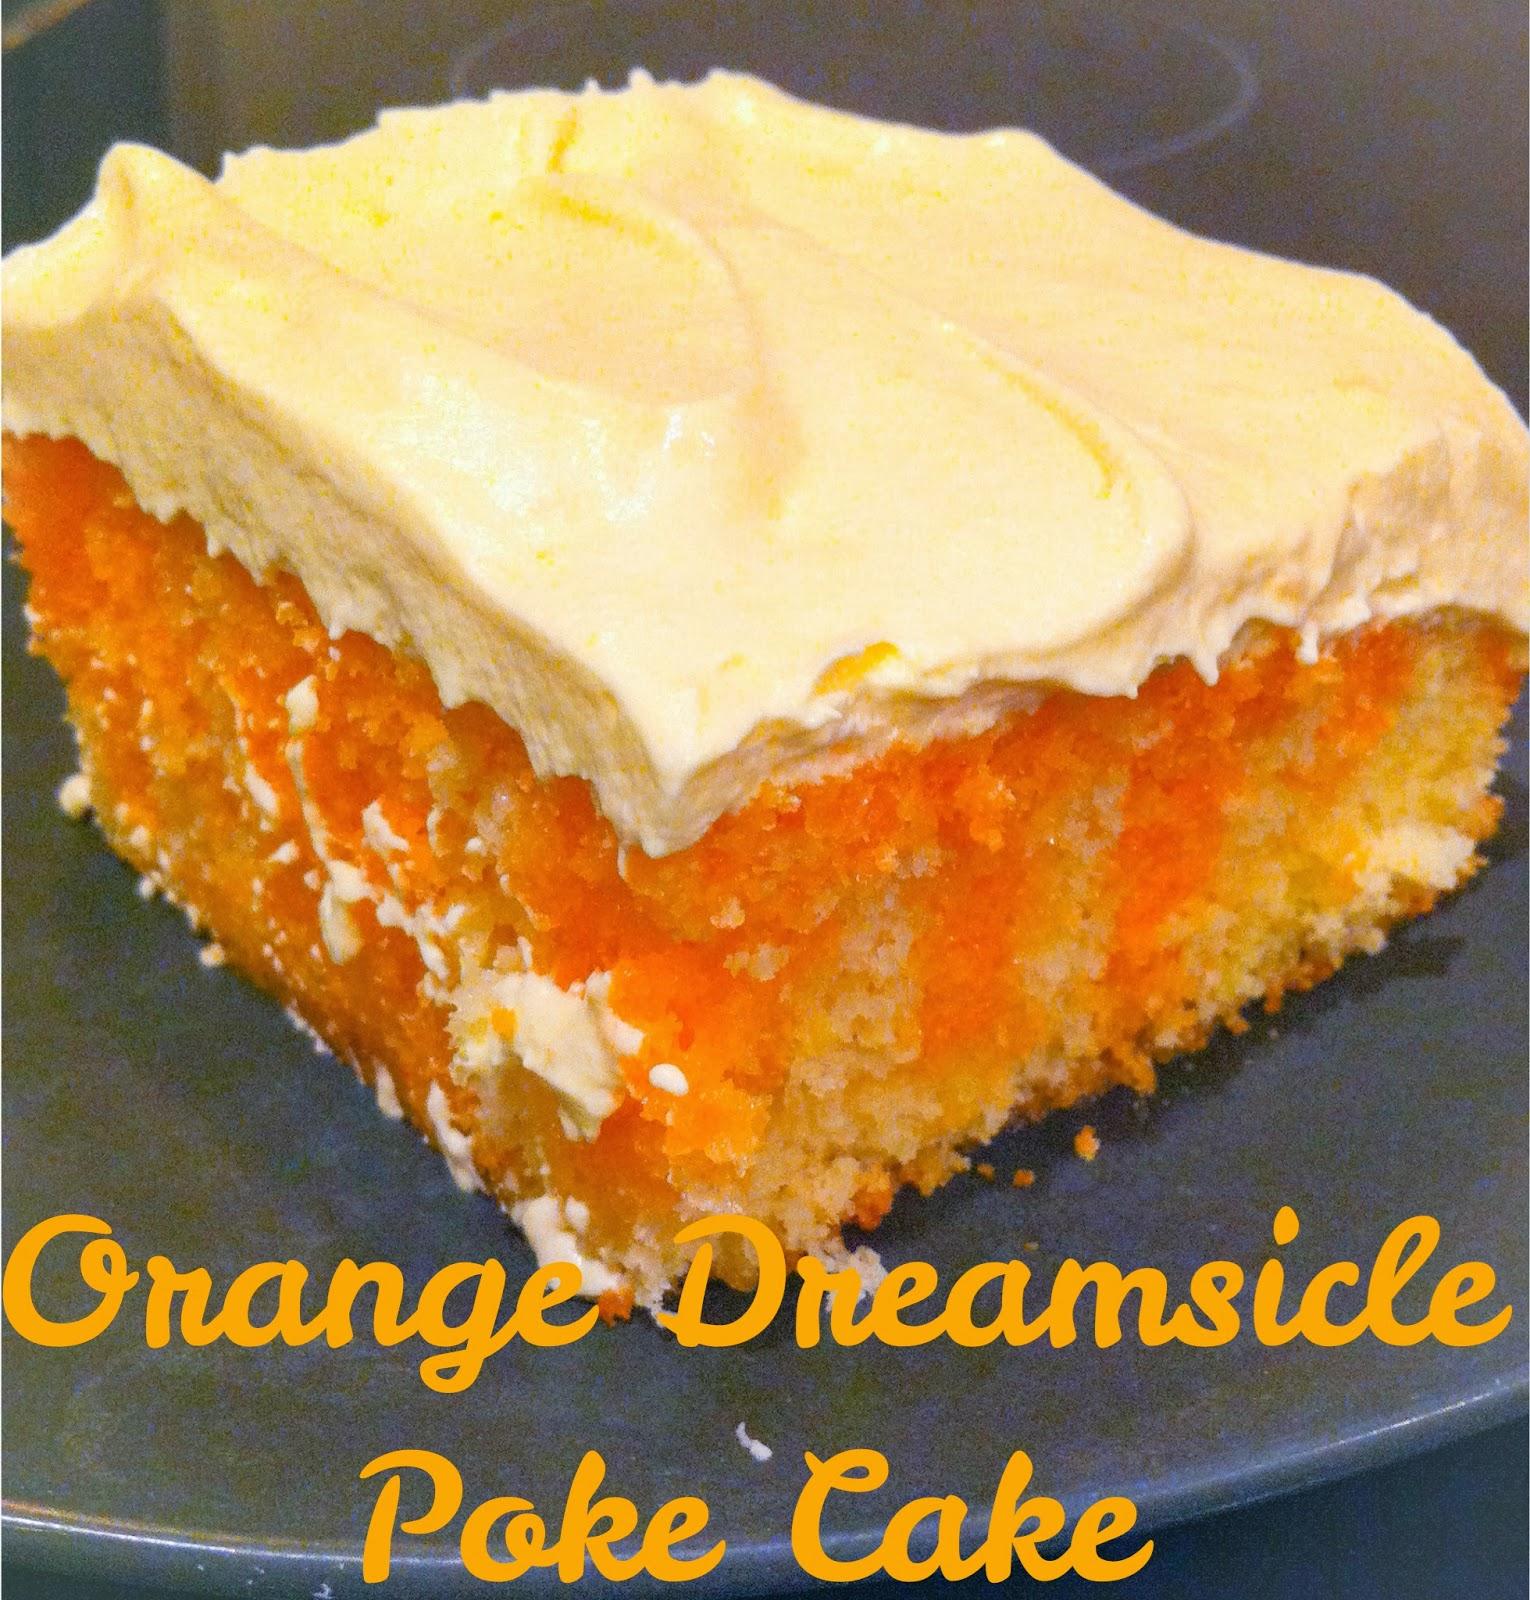 Orange Dreamsicle Poke Cake- Alohamora http://alohamoraopenabook.blogspot.com/